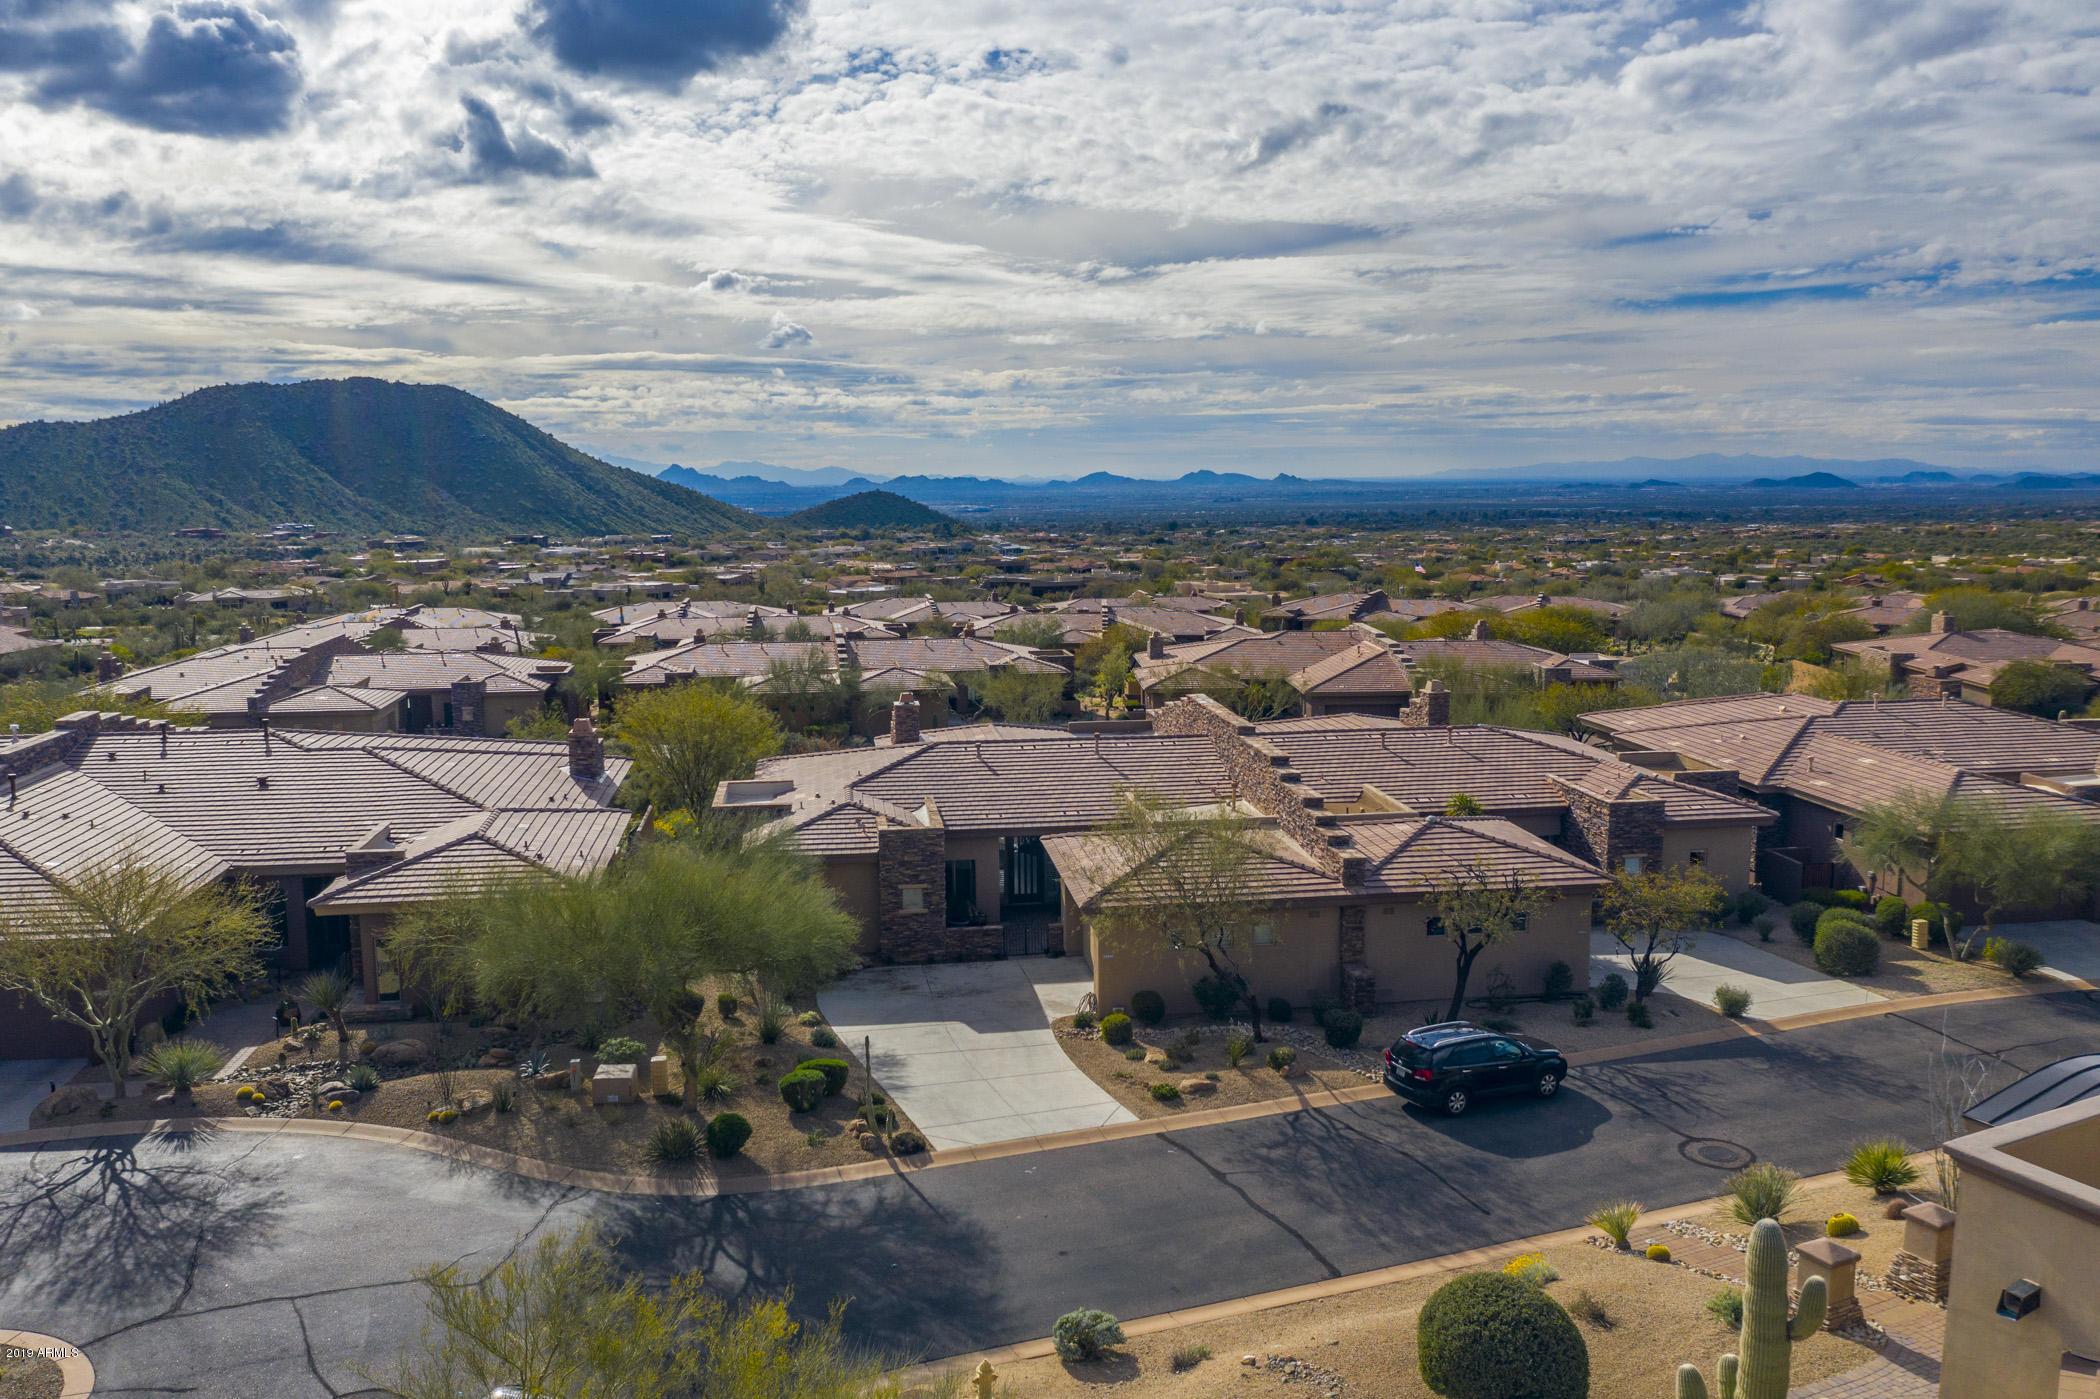 MLS 5869557 24640 N 109TH Place, Scottsdale, AZ 85255 Scottsdale AZ Luxury